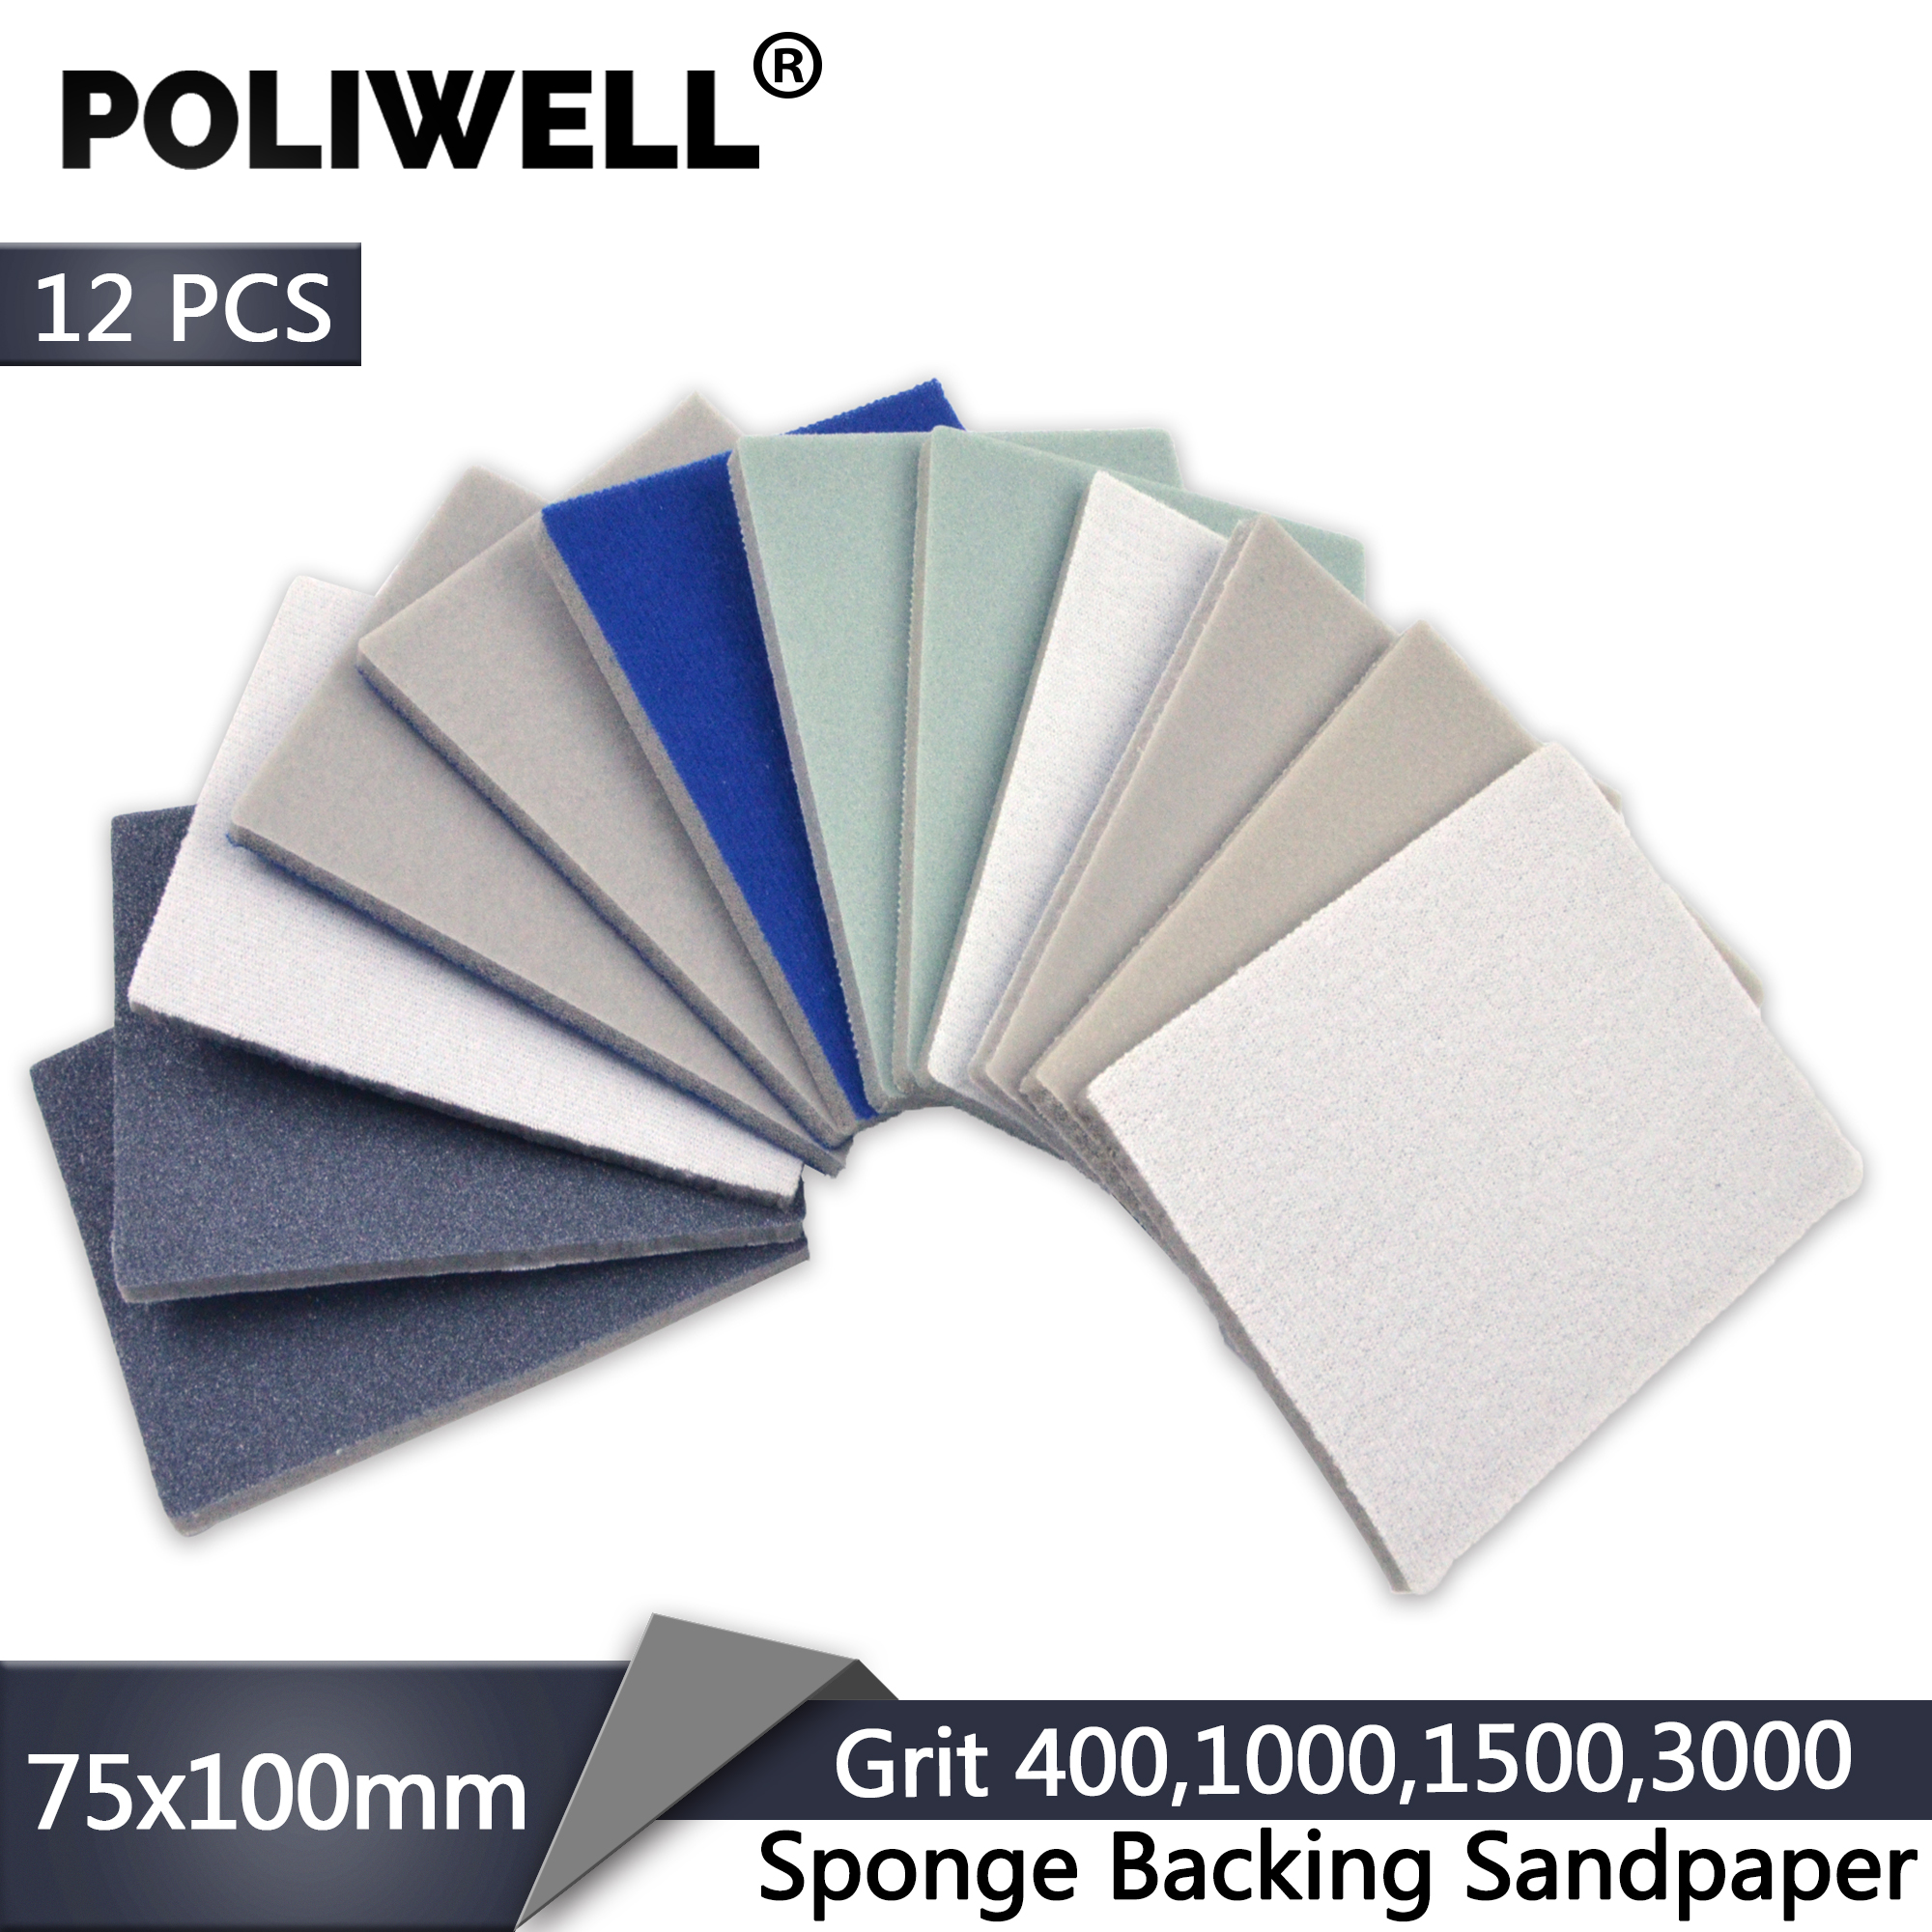 POLIWELL 12Pcs 75x100mm Sanding Sponge Block Pad Sandpaper 400 1000 1500 3000 Grit Flocking Abrasive Paper Sponge Sanding Sheets